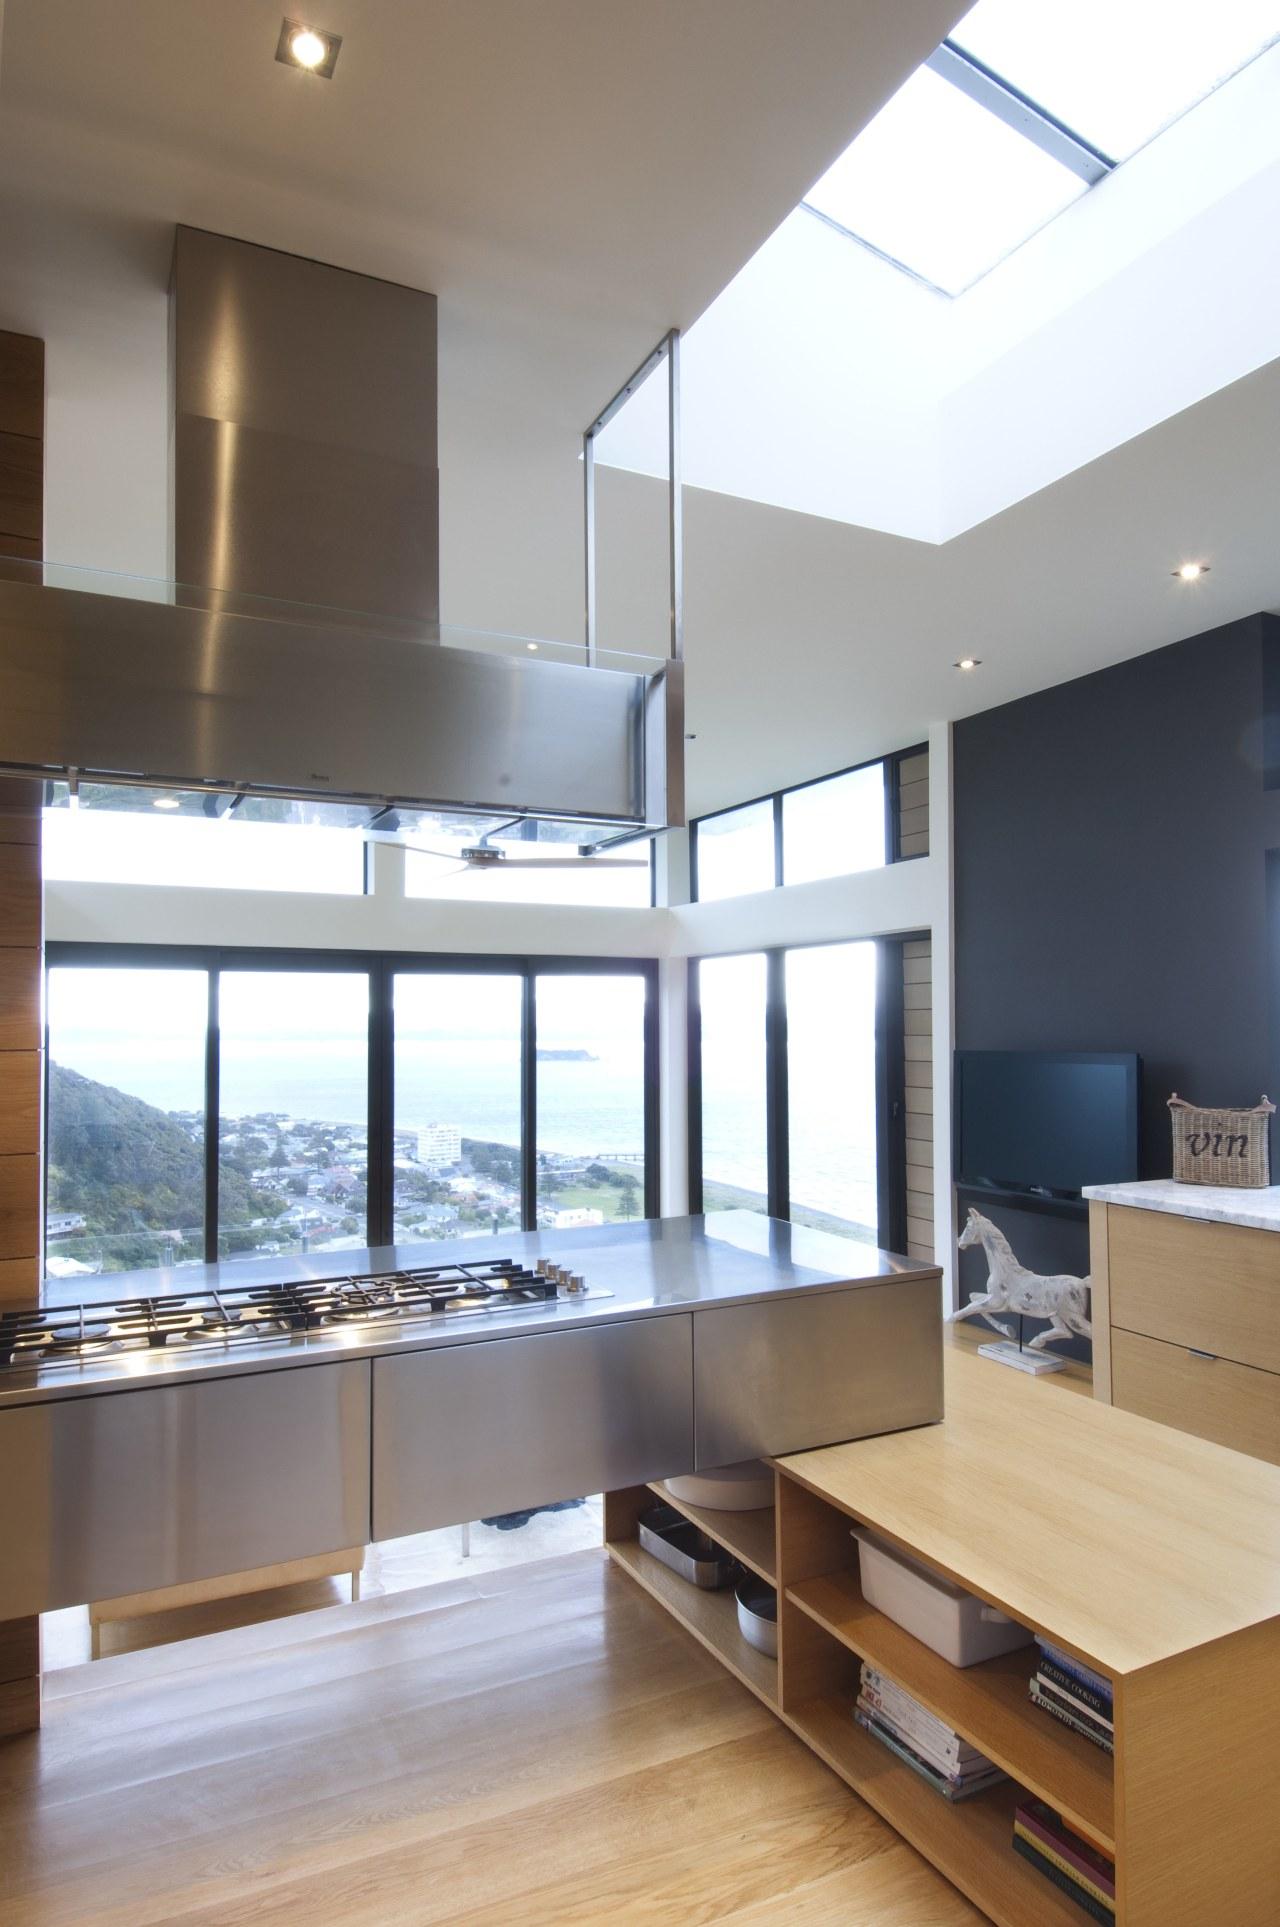 Raised floor kitchen. Stainless steel Binova cooktop. American architecture, daylighting, interior design, kitchen, white, gray